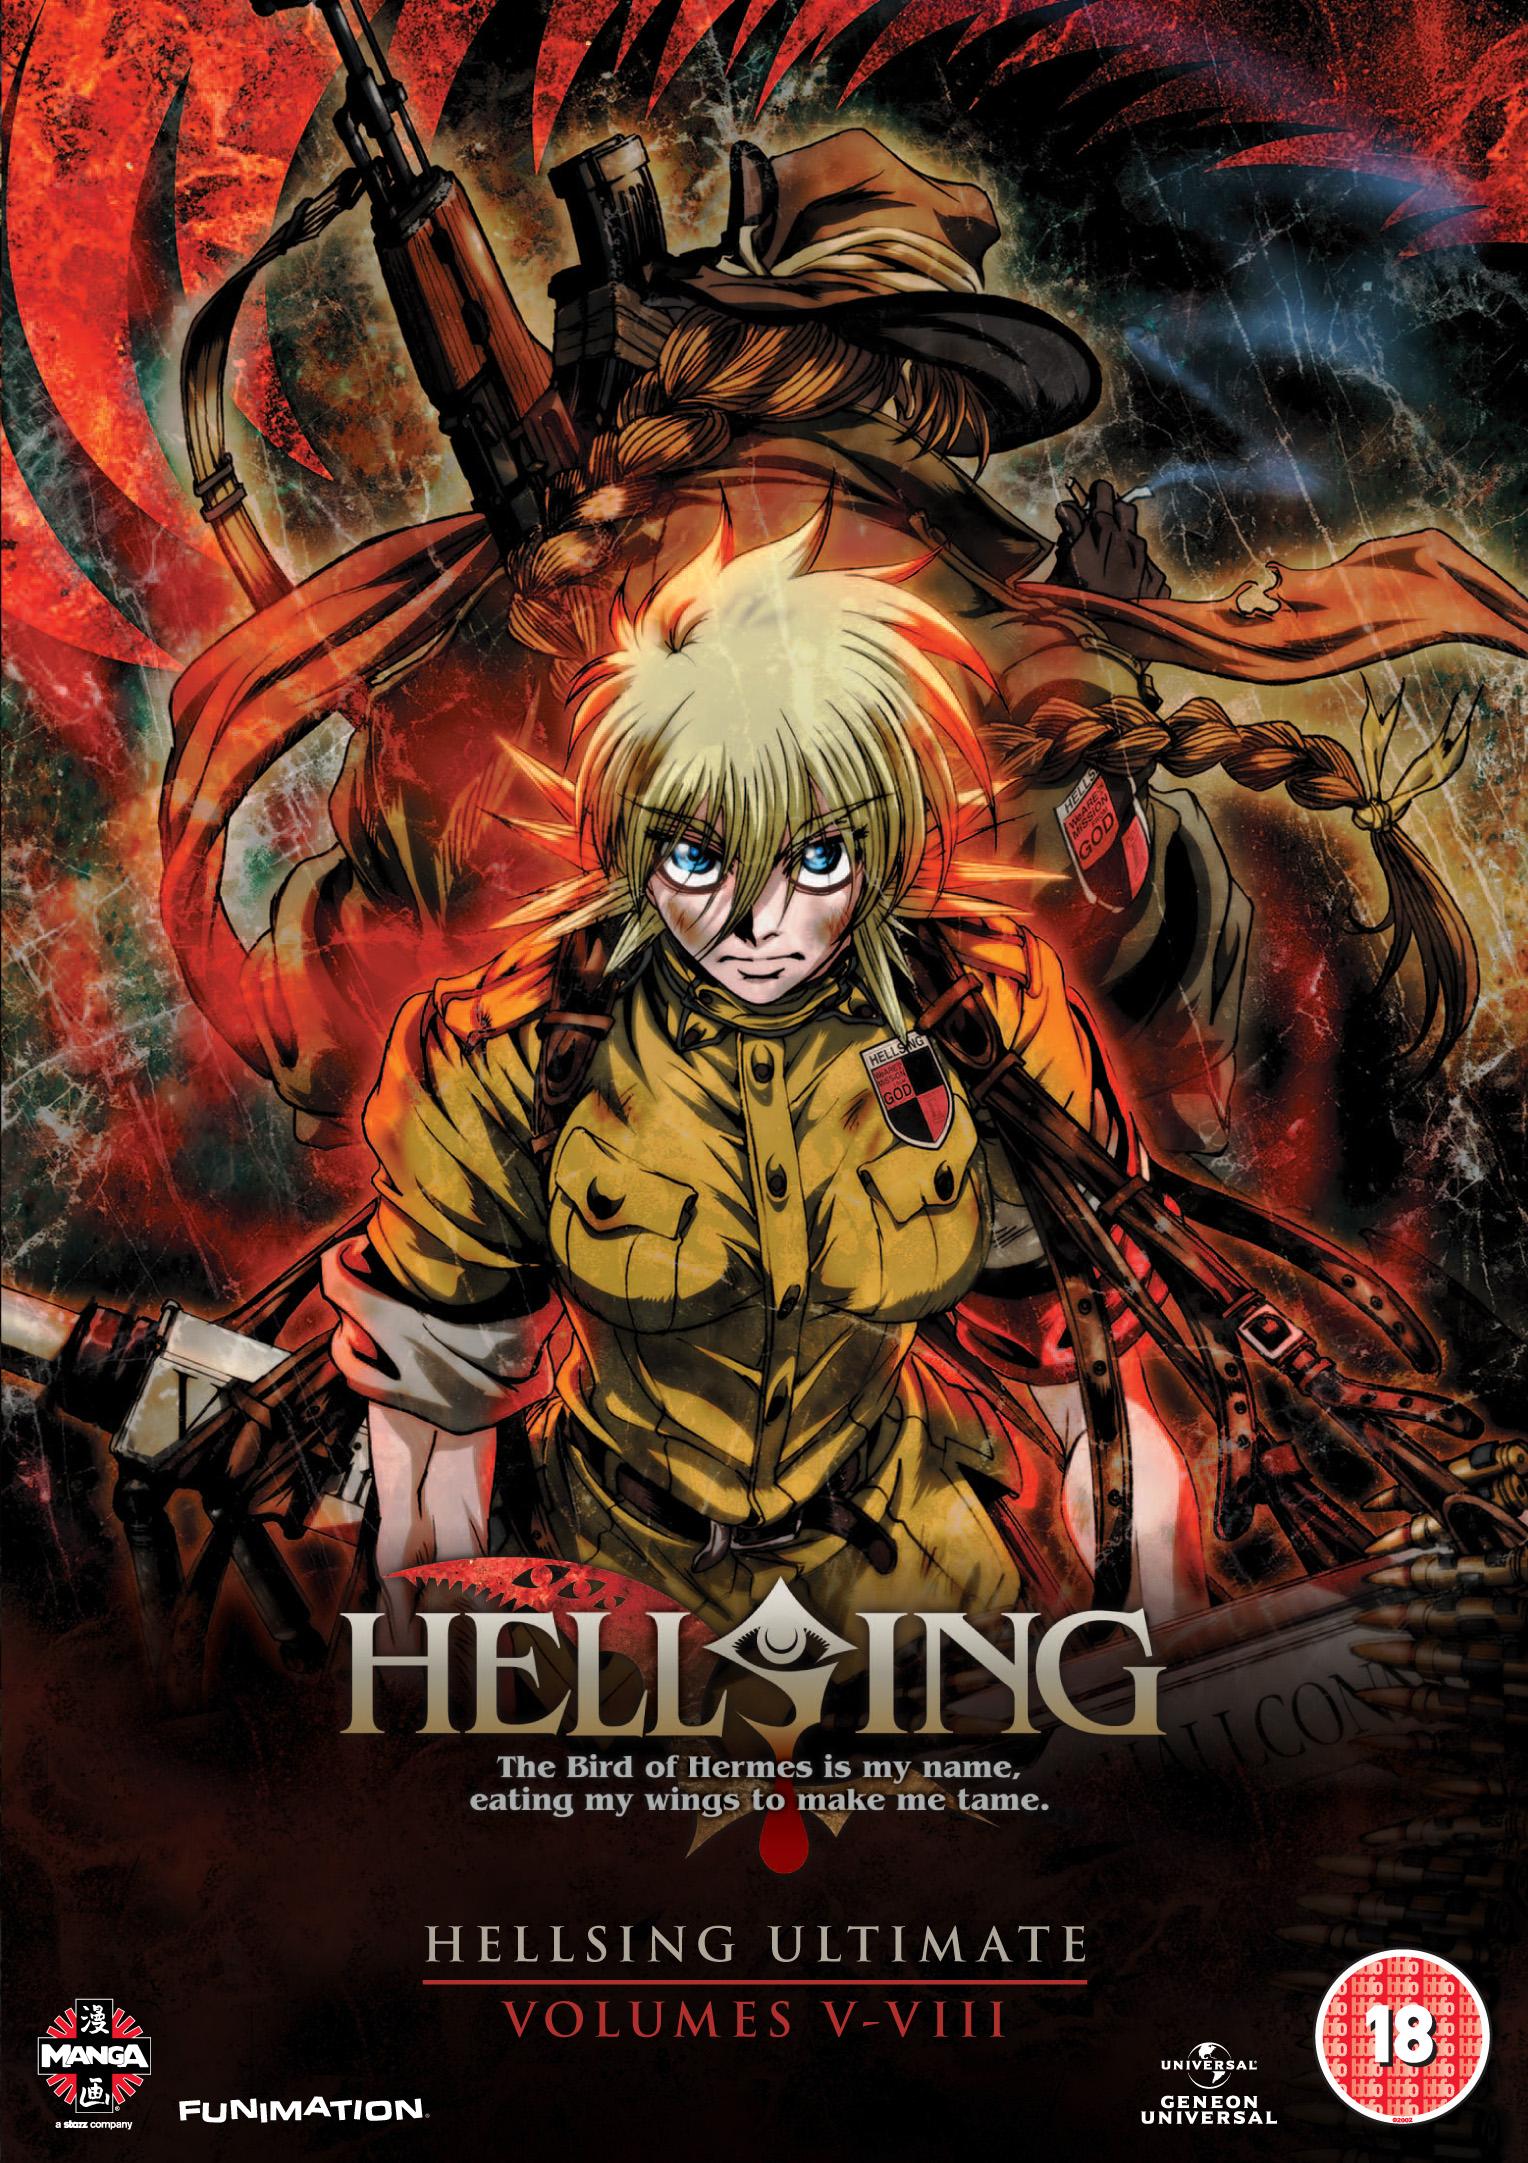 hellsing ultimate animation studio